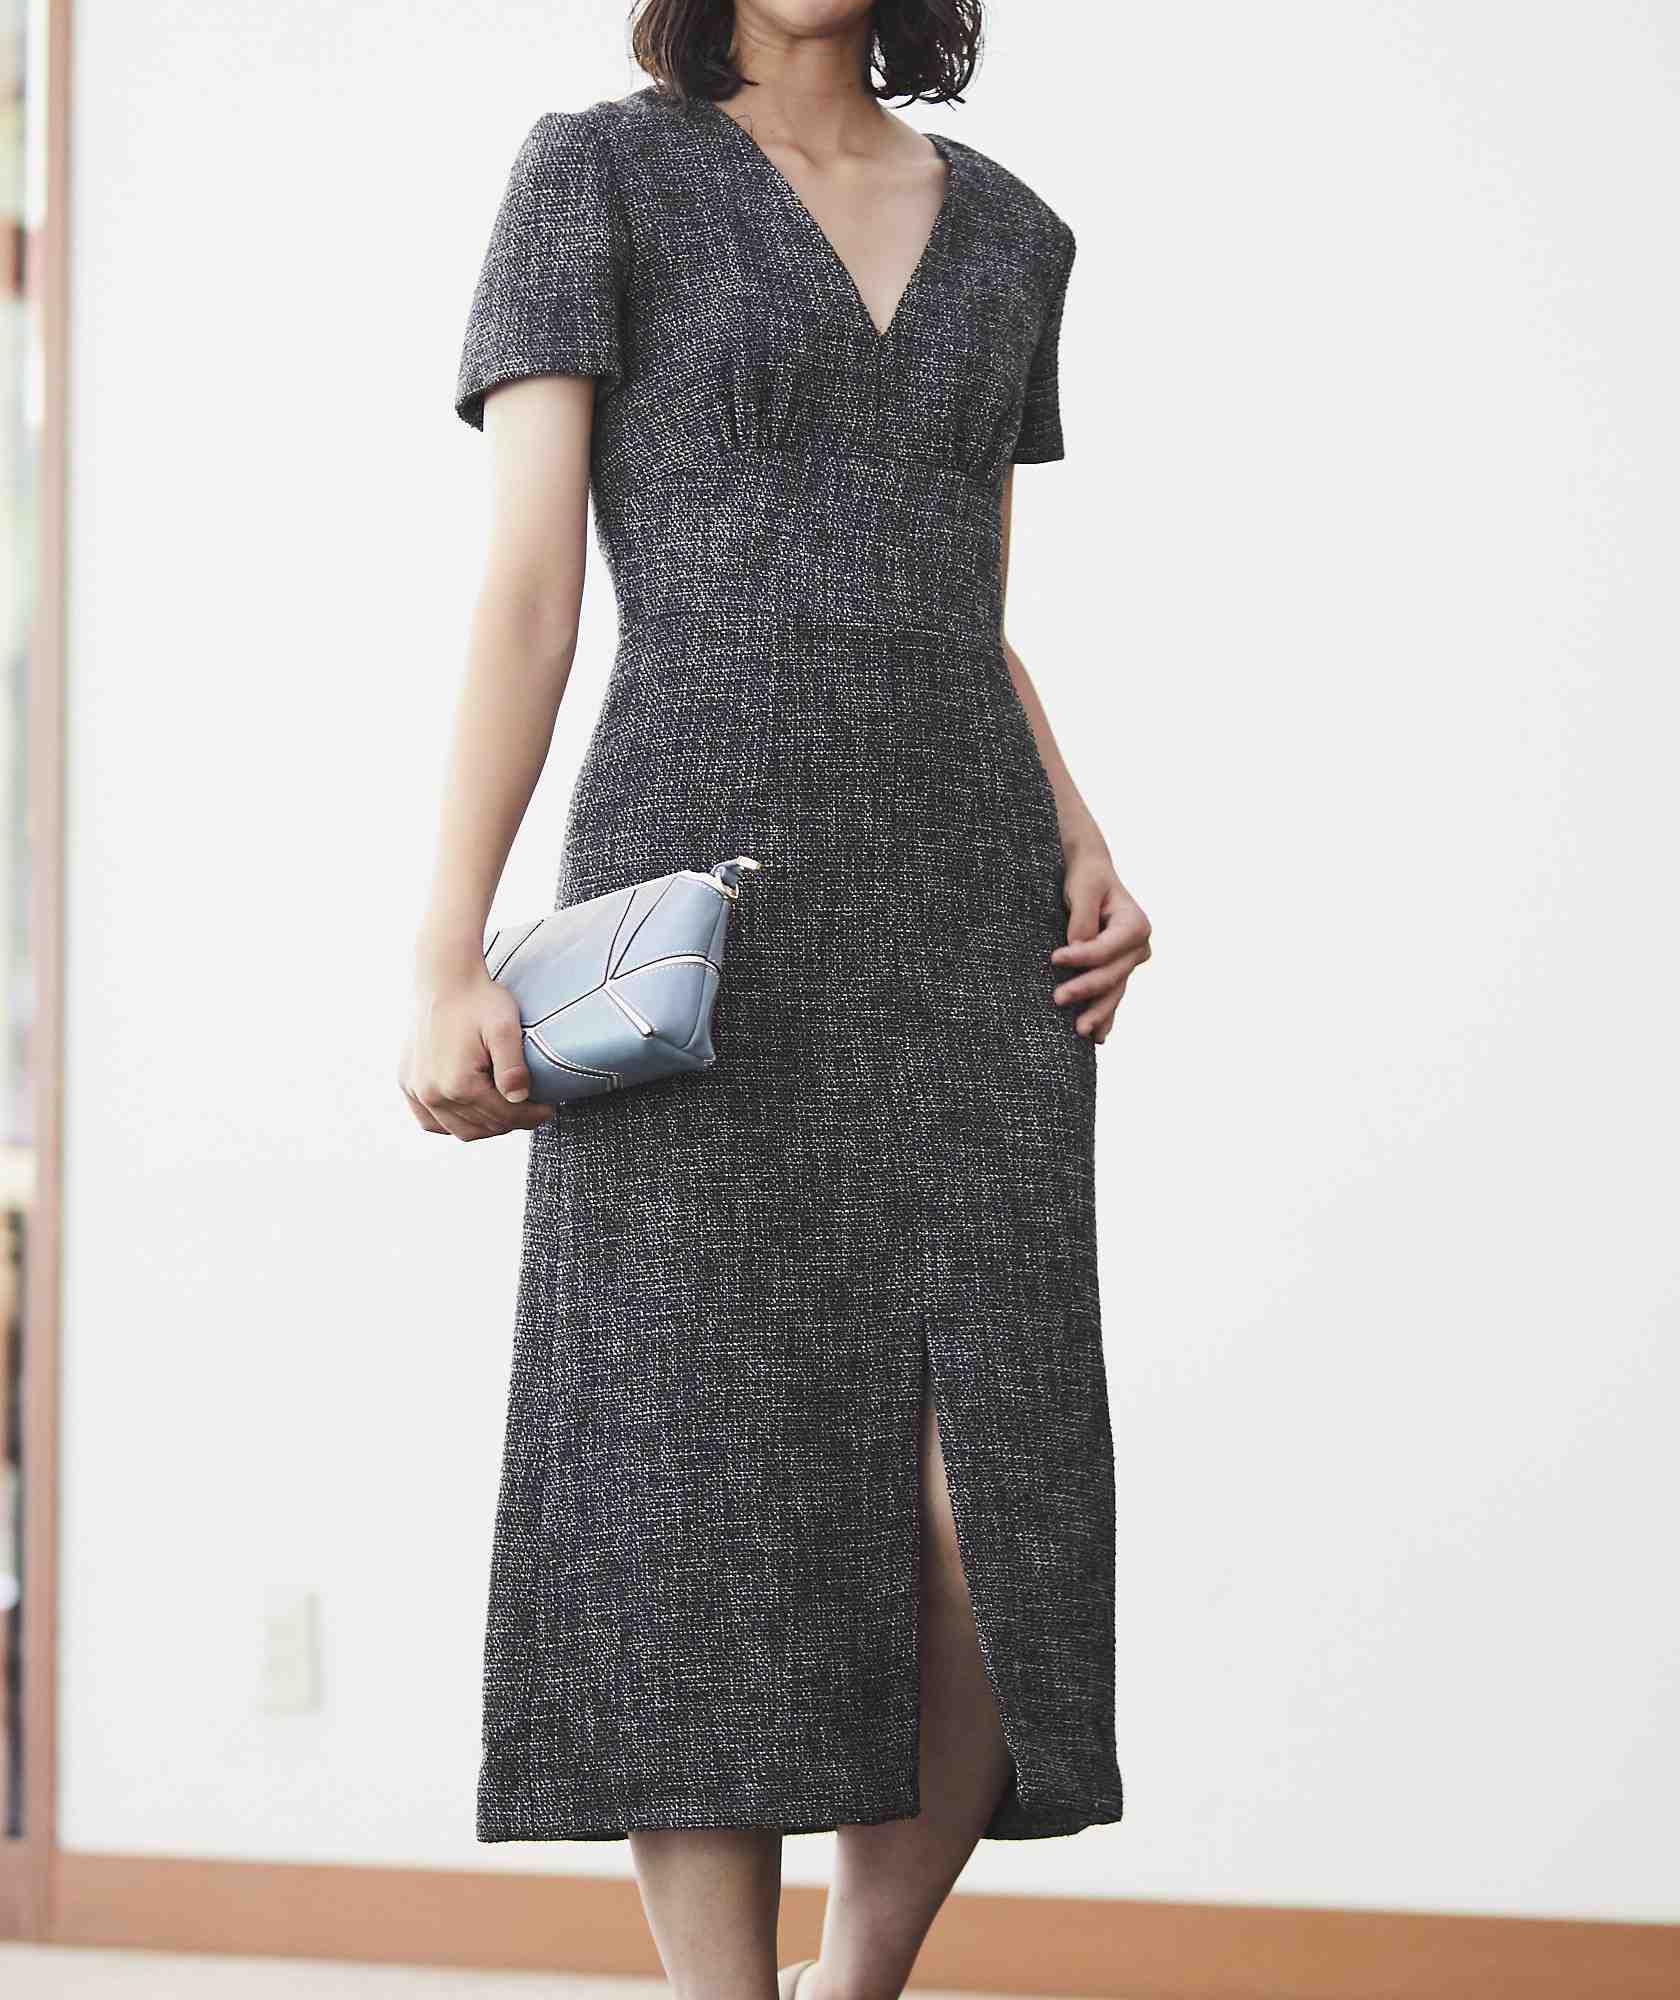 Vネックツイードライクミディアムドレス-ブラック-S